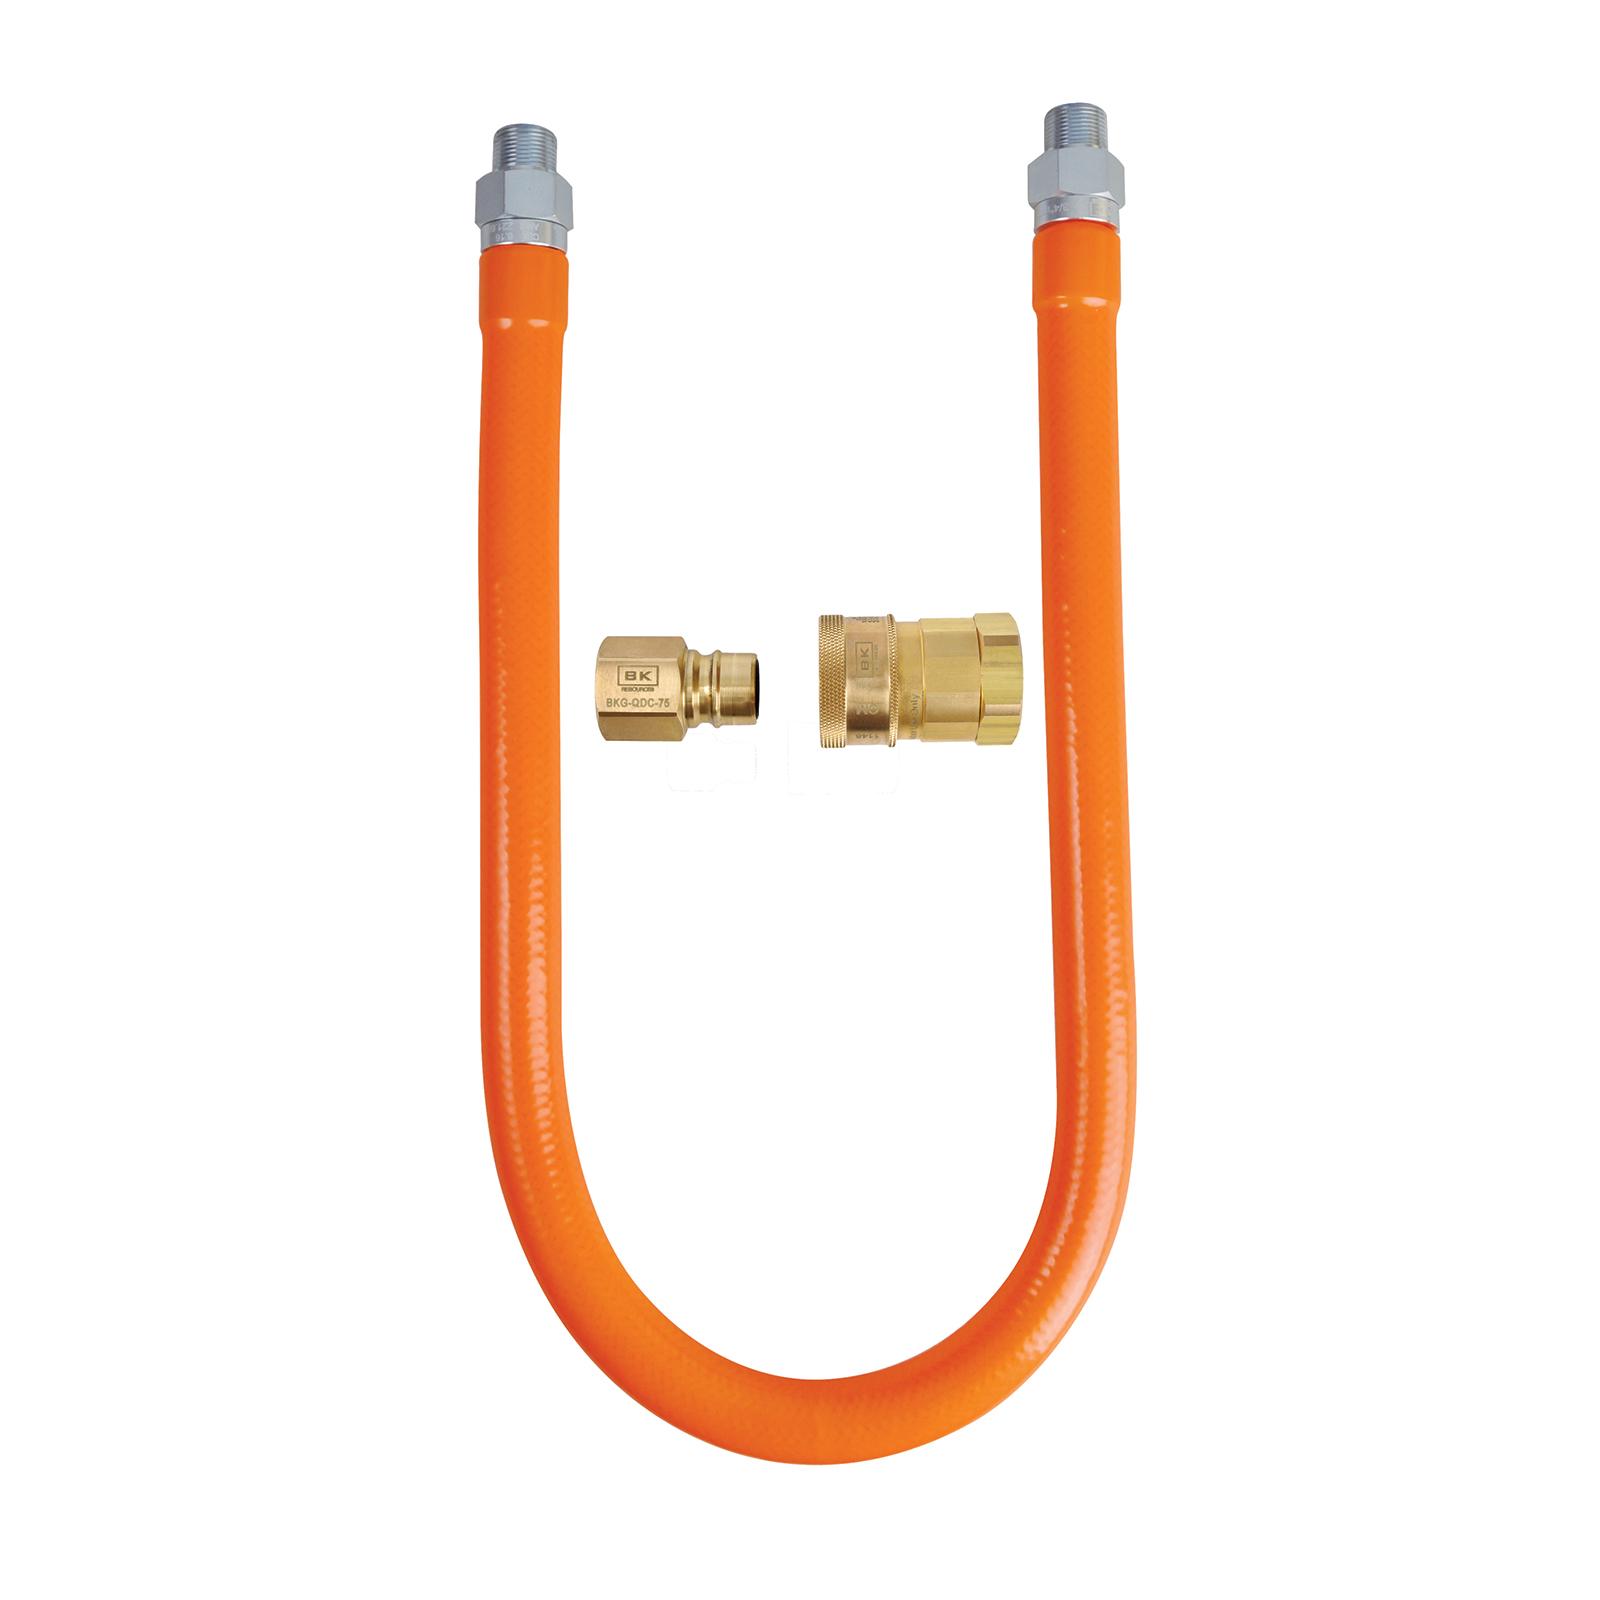 BK Resources BKG-GHC-7536-QD-PT gas connector hose kit